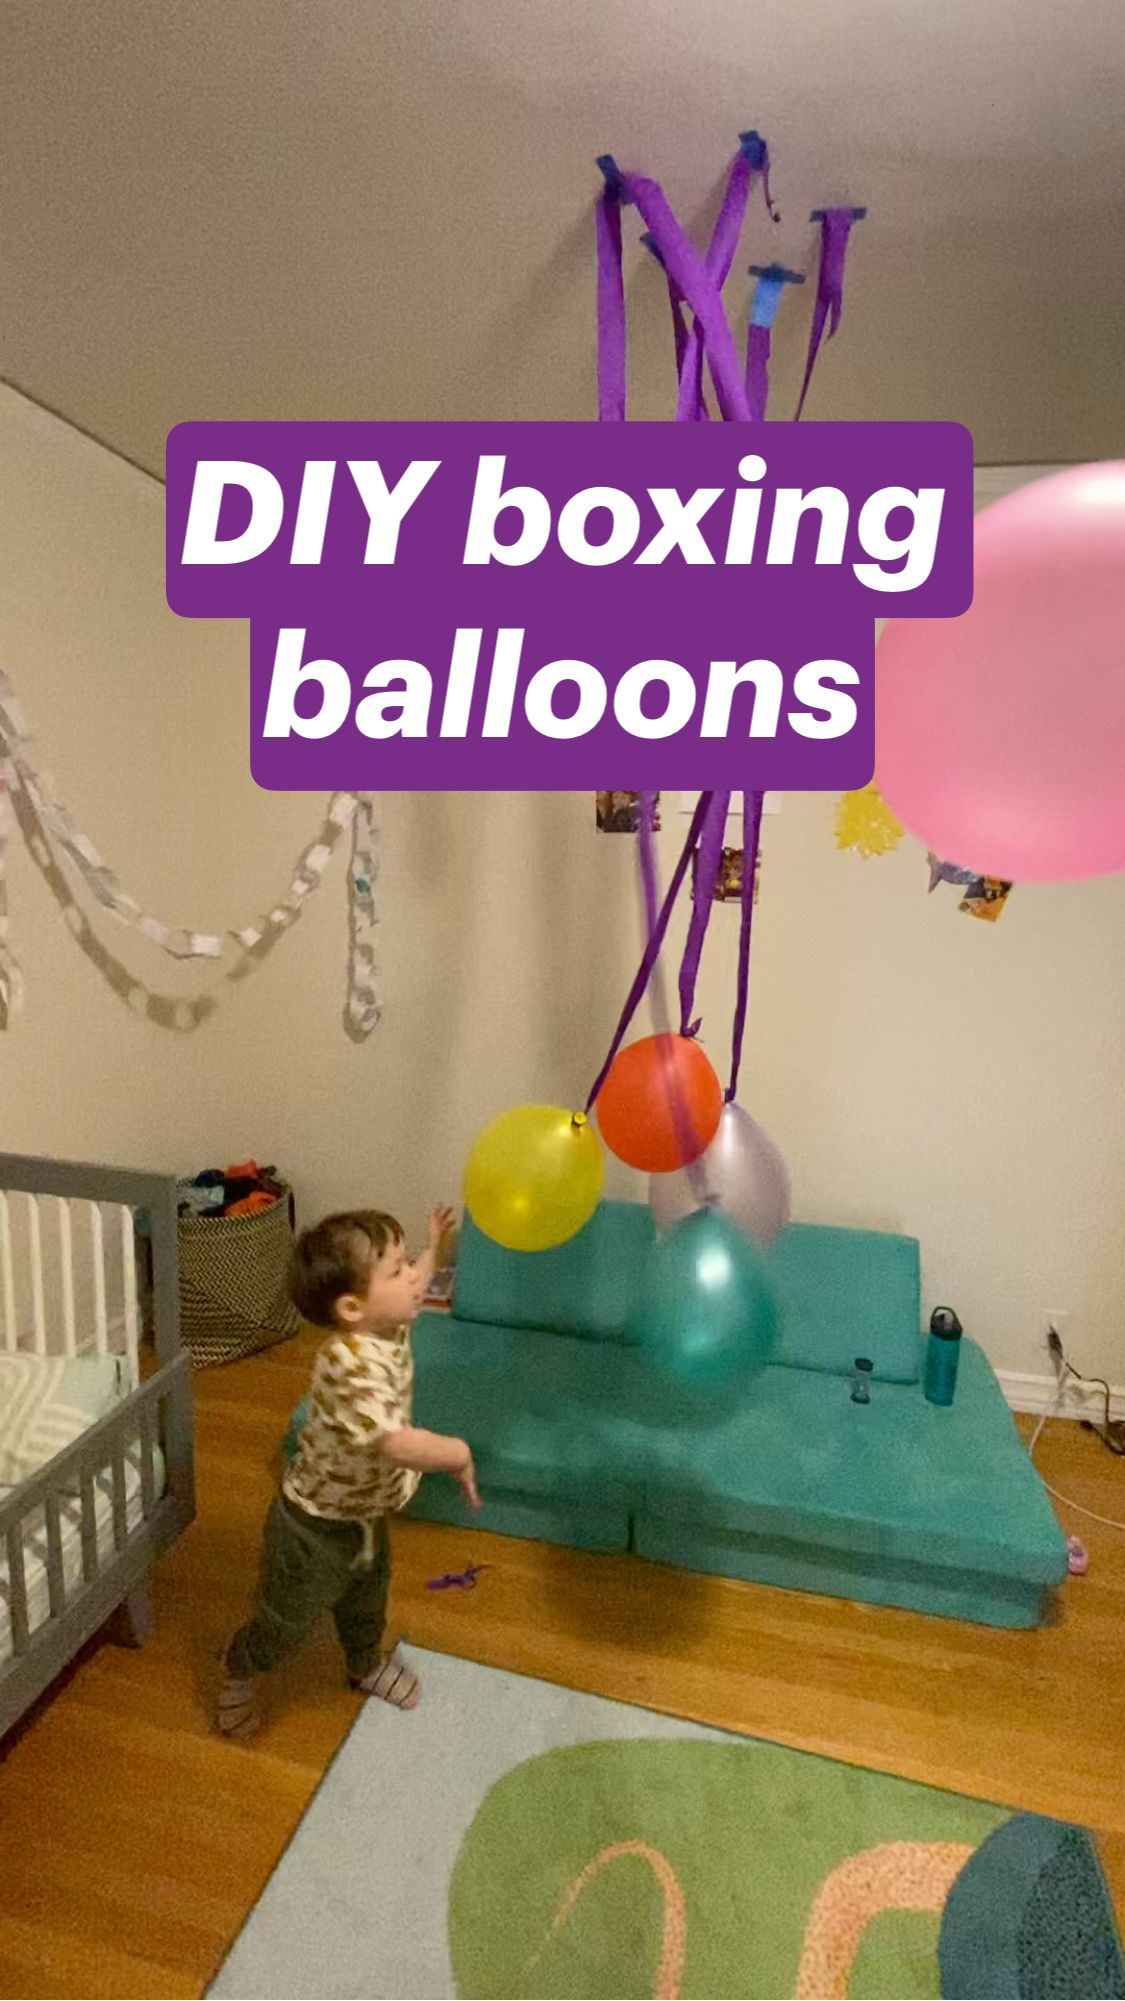 DIY boxing balloons